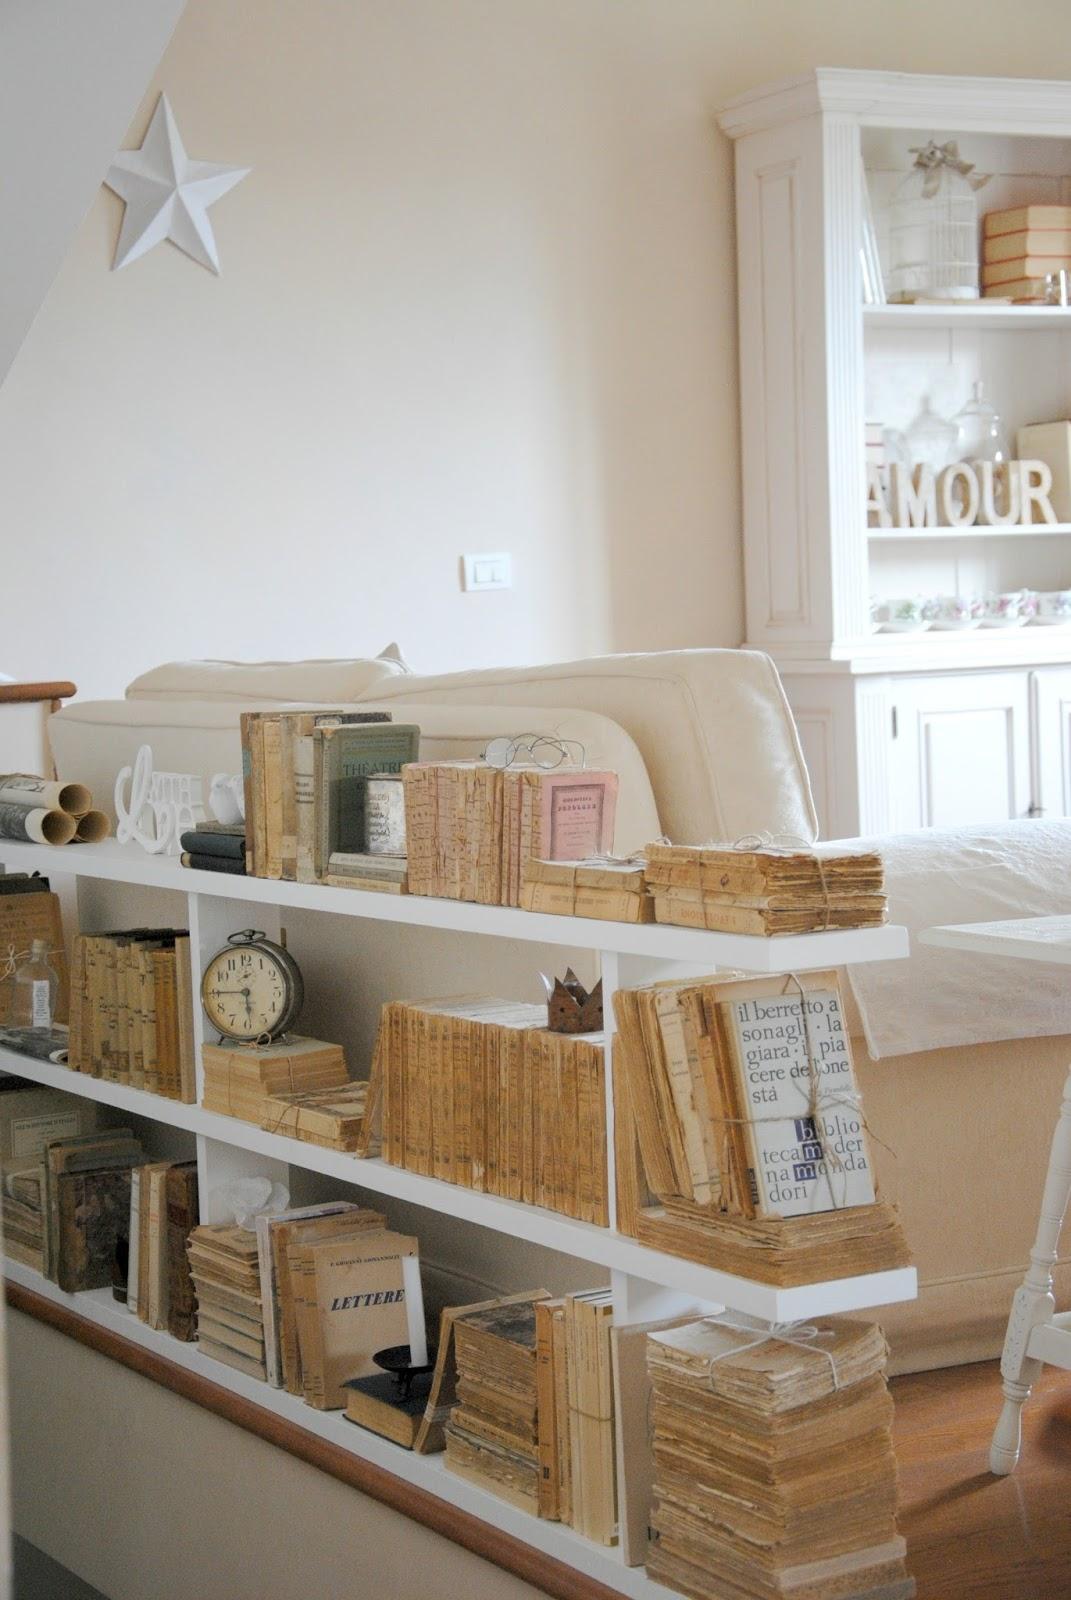 La gallinella bianca gennaio 2014 for Costruire la mia piccola casa online